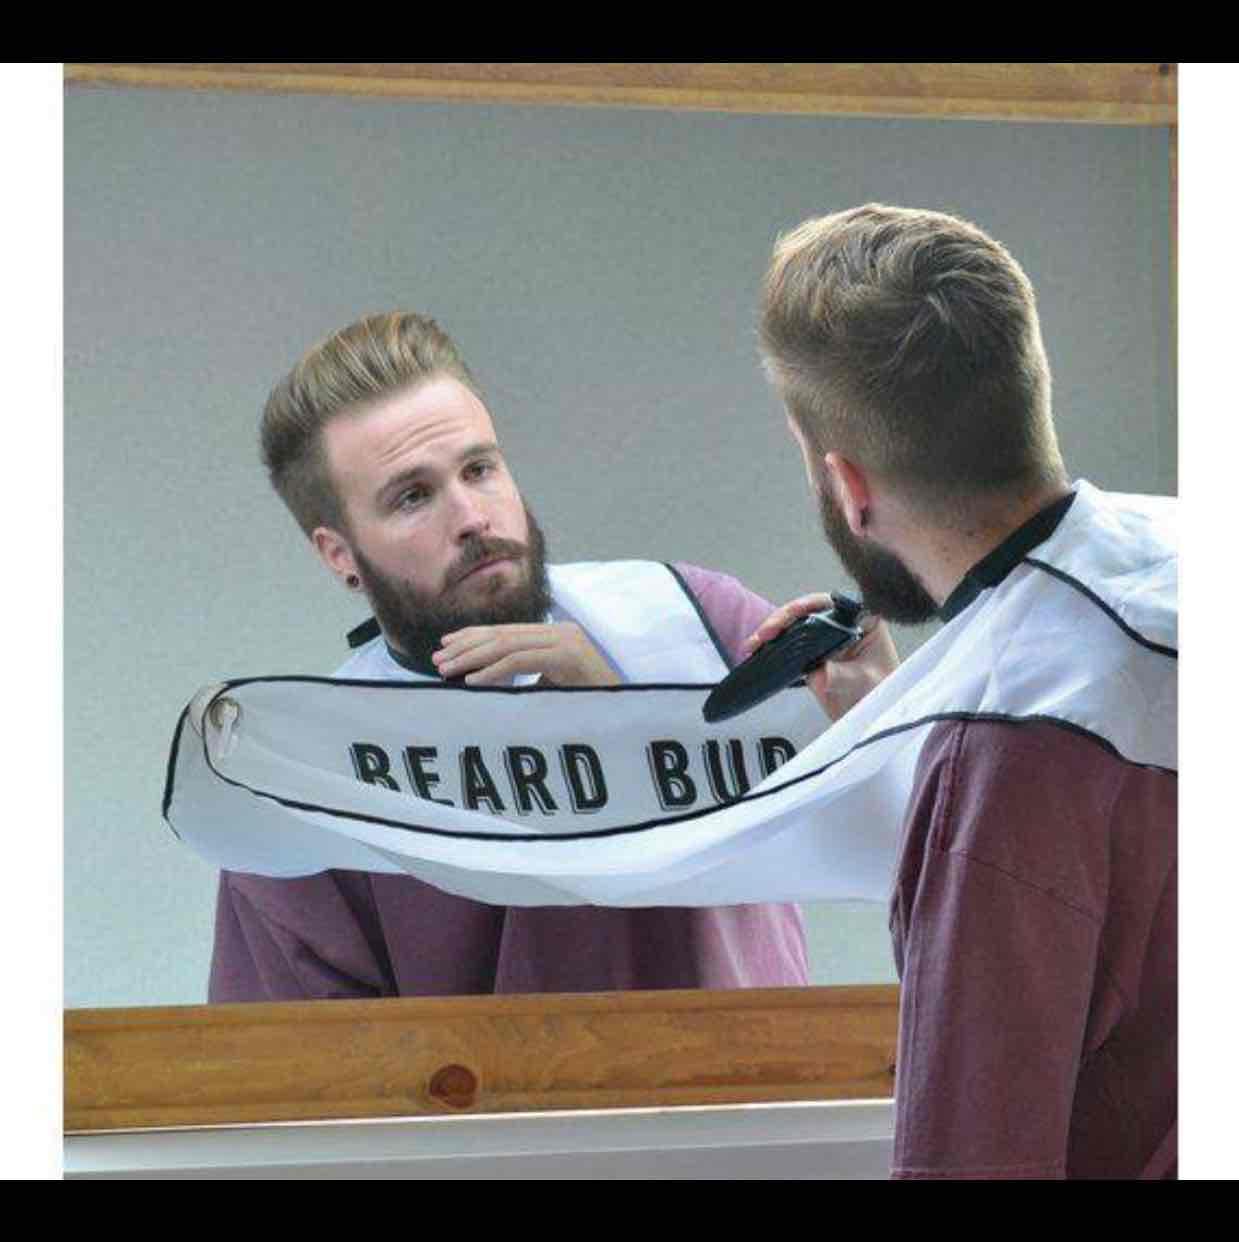 beard buddy - £4.49 @ Argos (C&C)